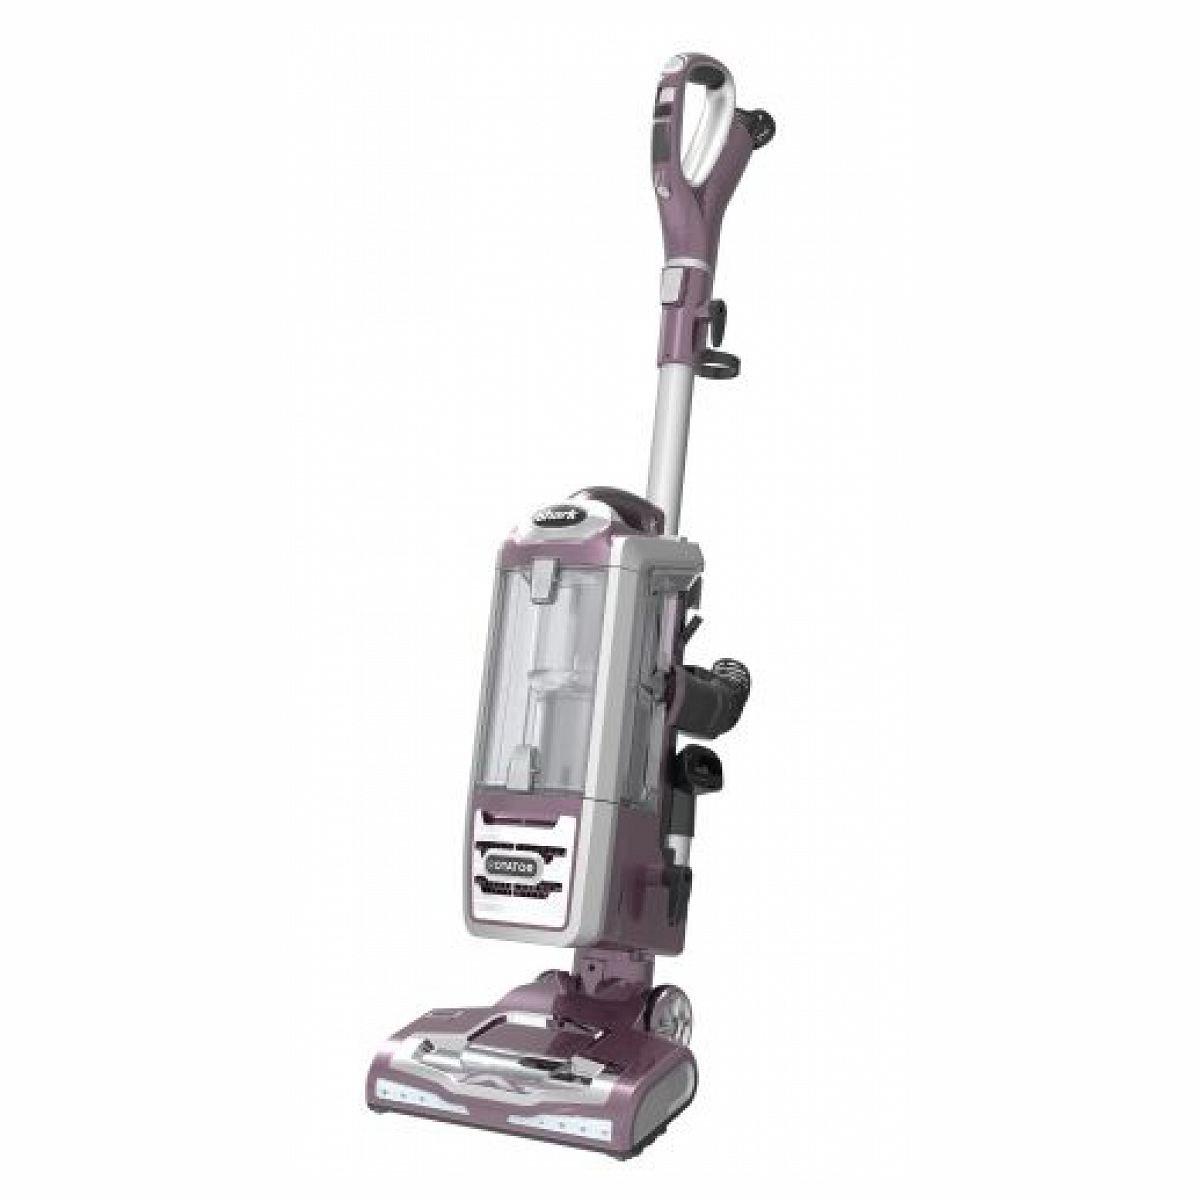 Shark Upright Vacuums